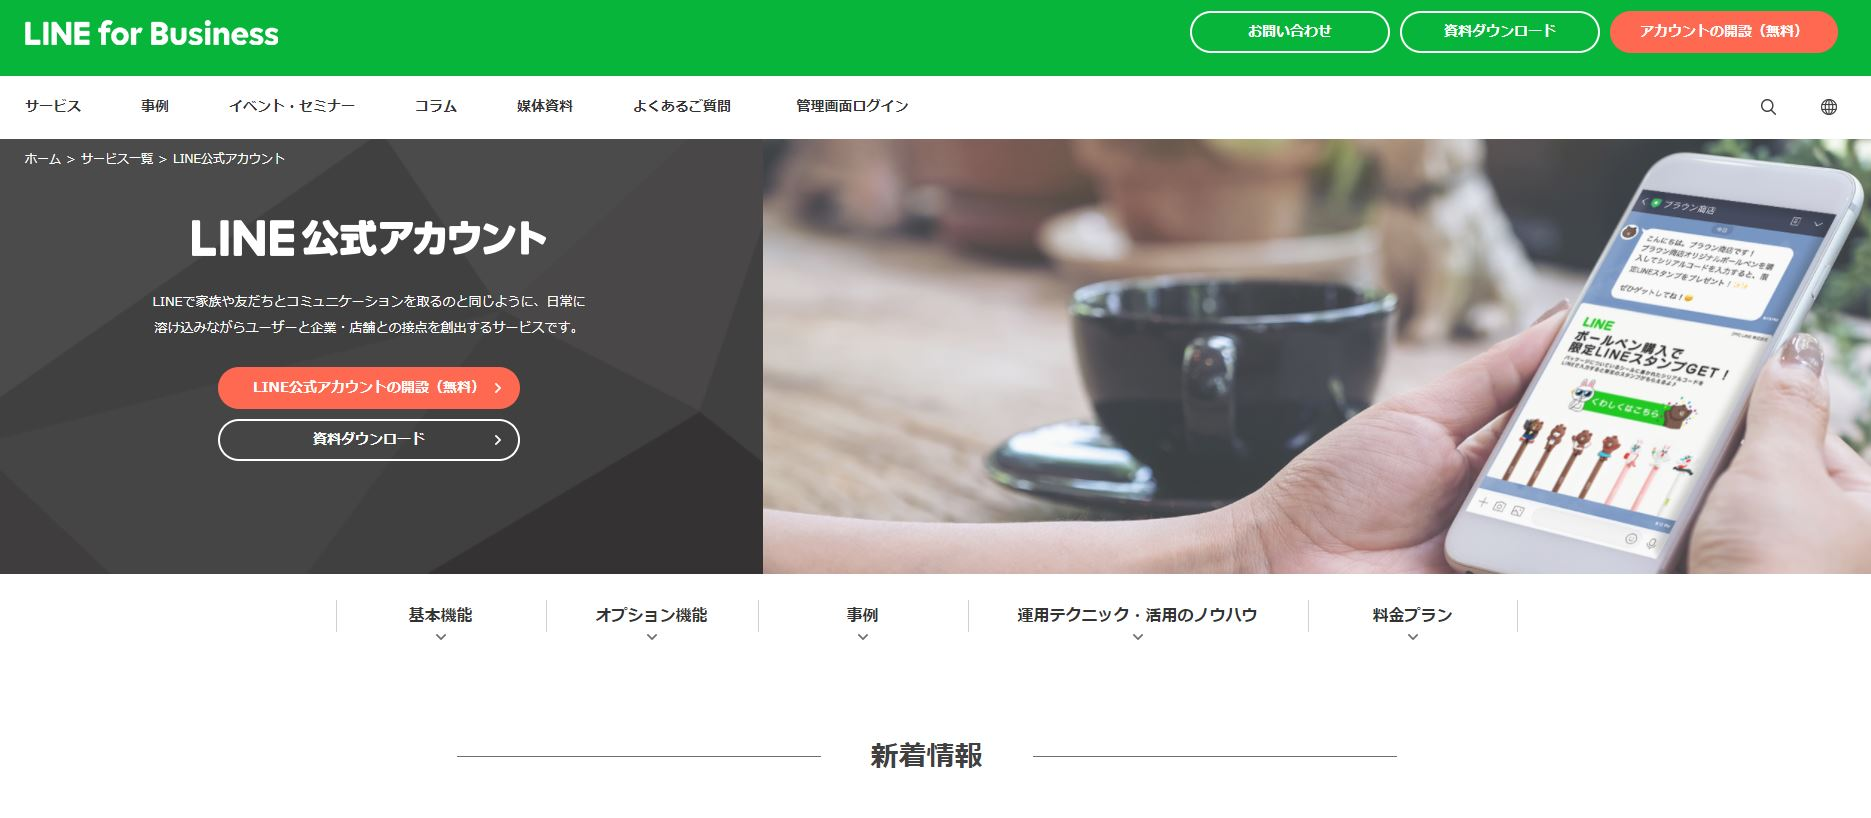 LINE公式サイトの図